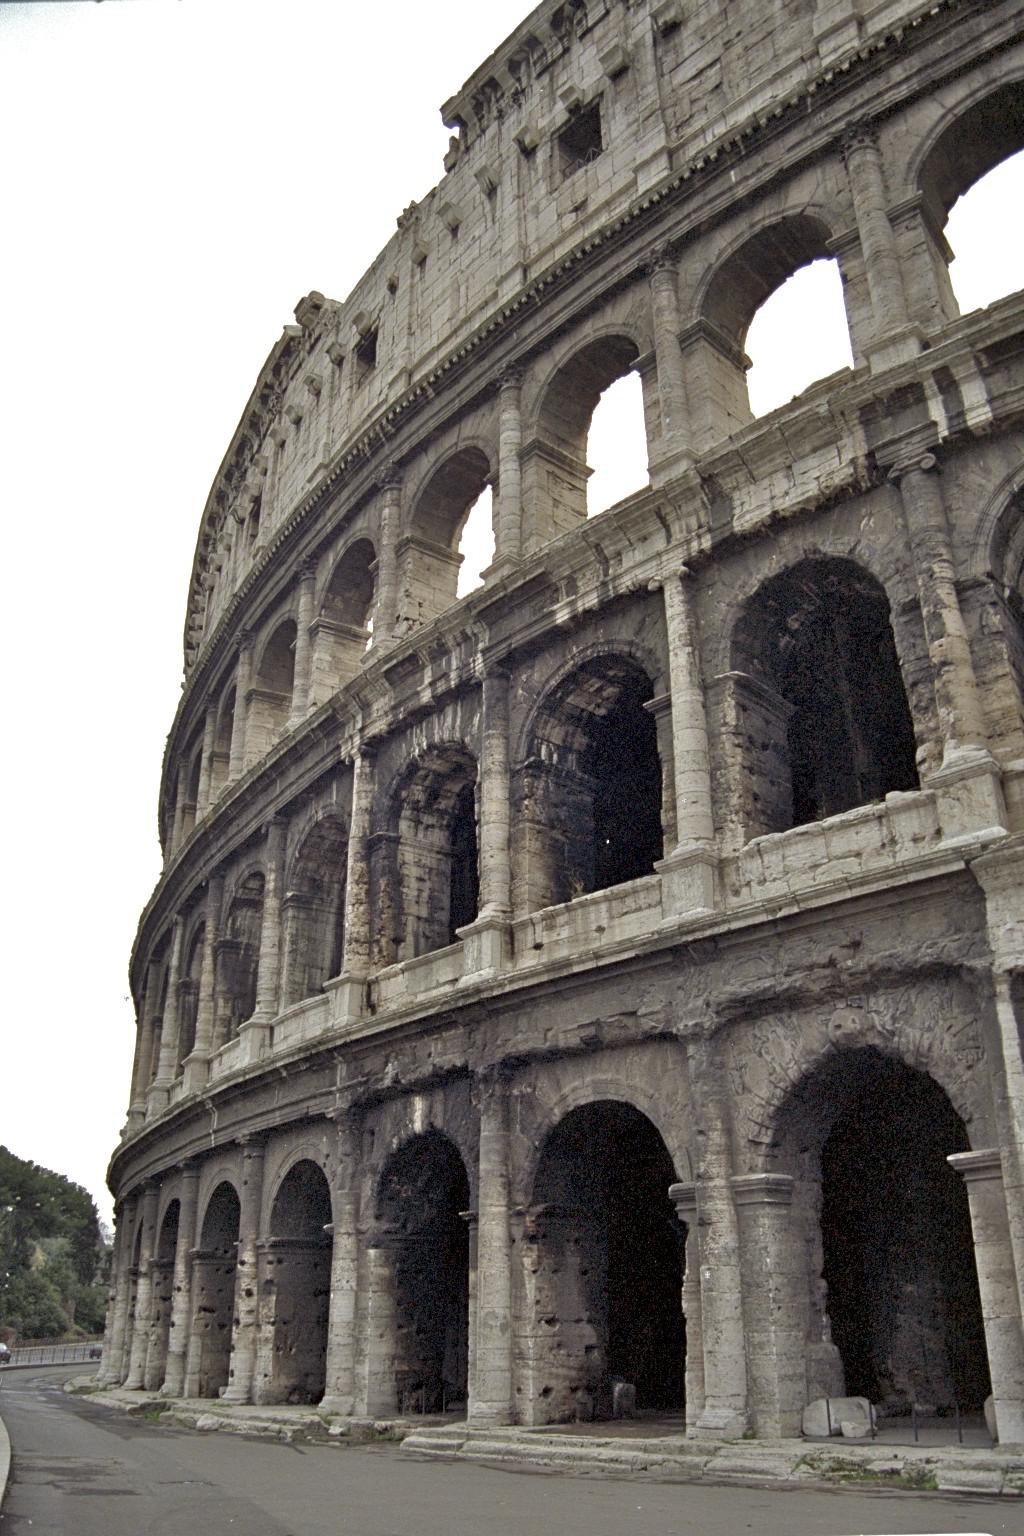 Colosseum, Roma 2